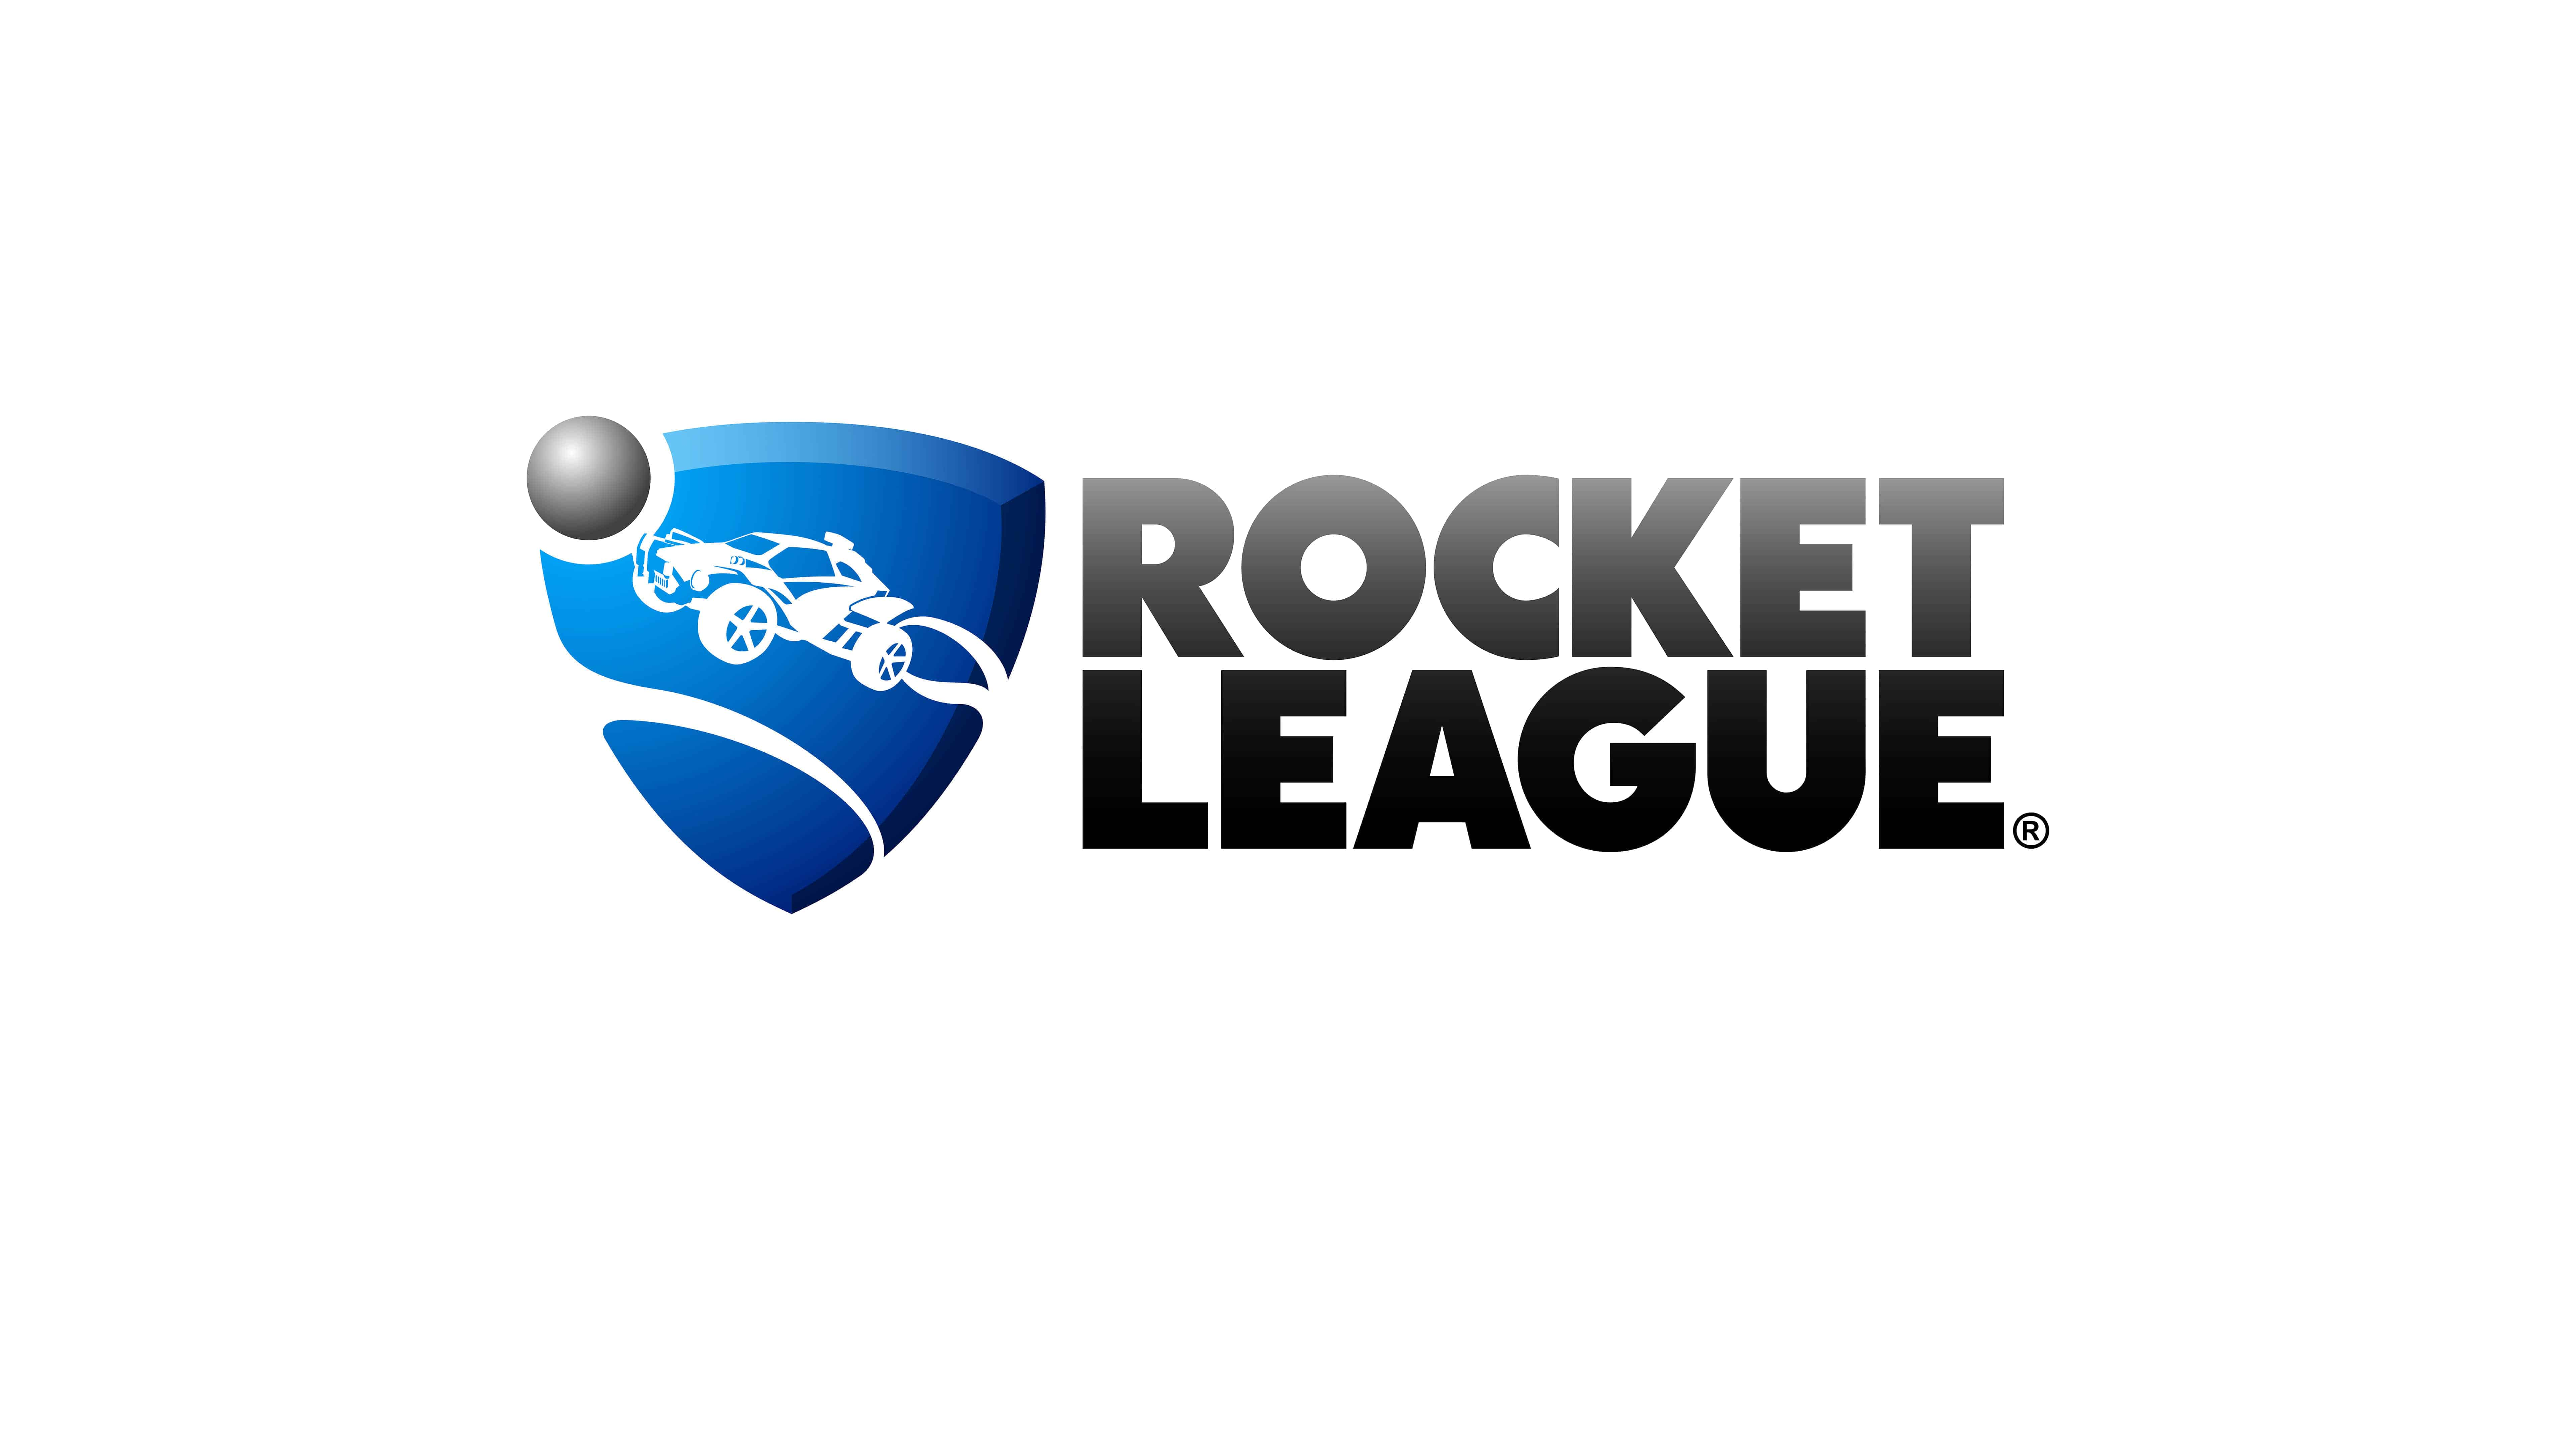 rocket league uhd 8k wallpaper